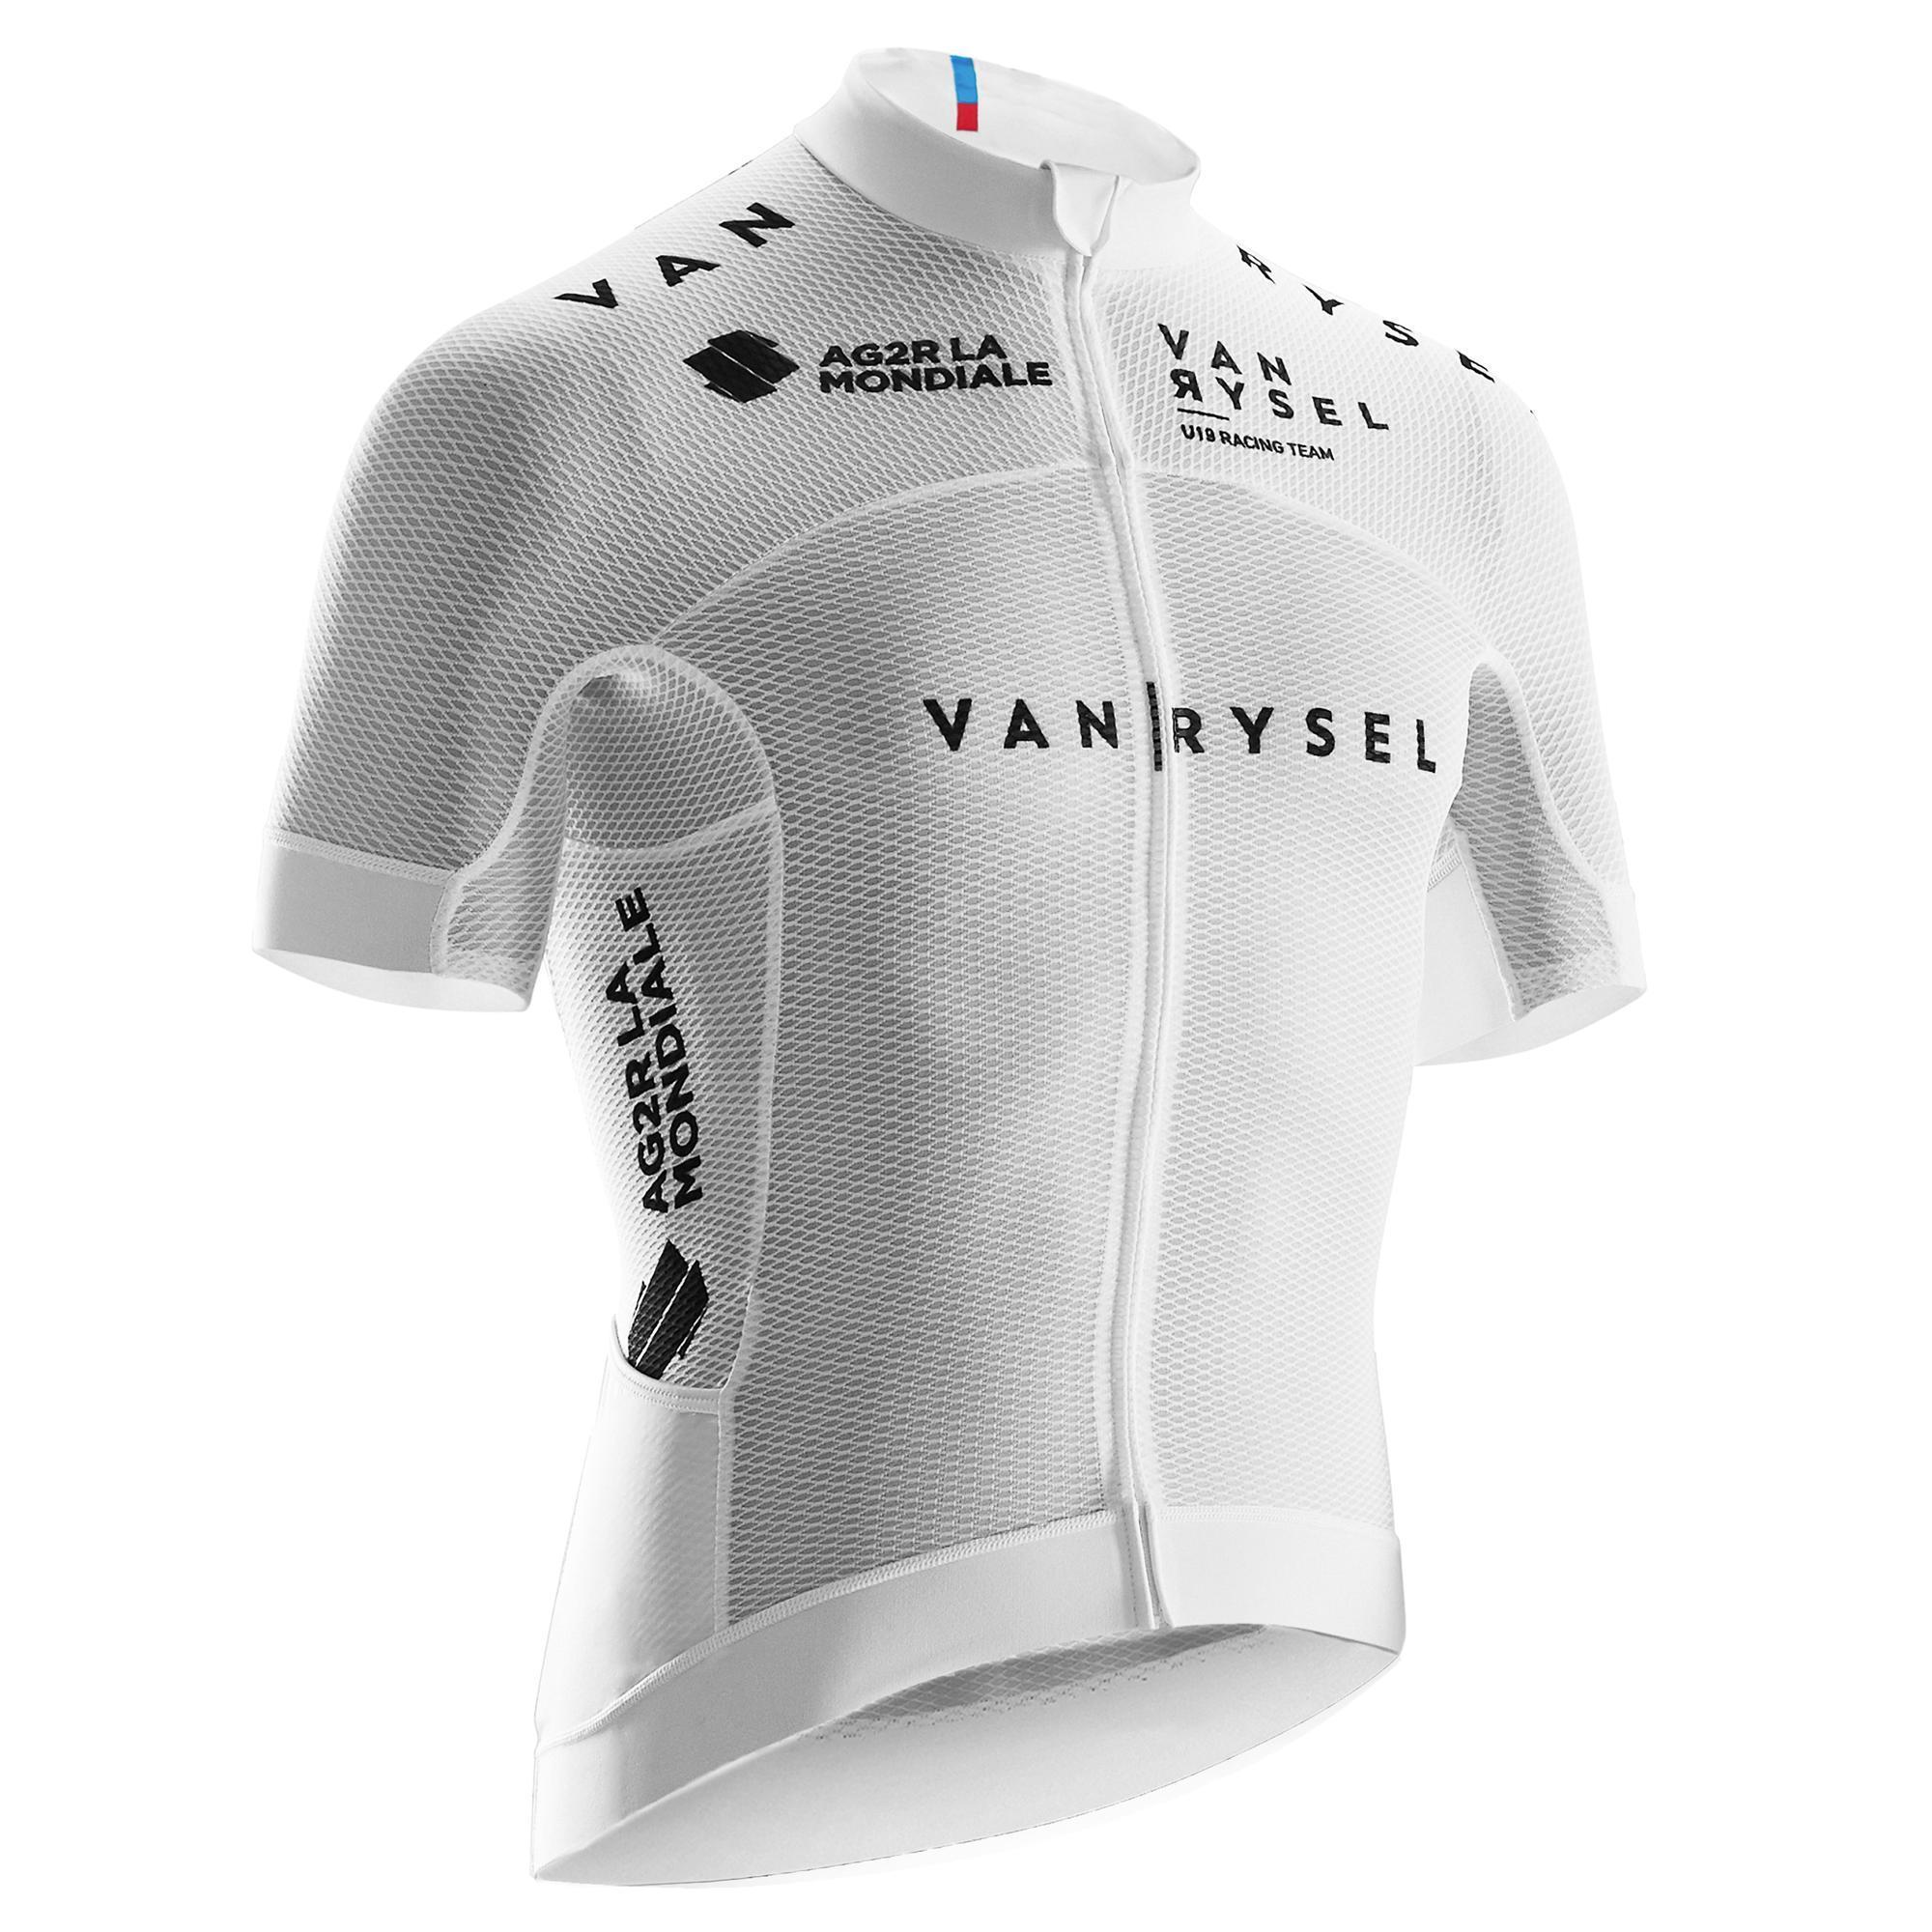 Fahrradtrikot kurzarm Rennrad RR 900 Team Mesh Herren | Sportbekleidung > Trikots > Fahrradtrikots | Van rysel